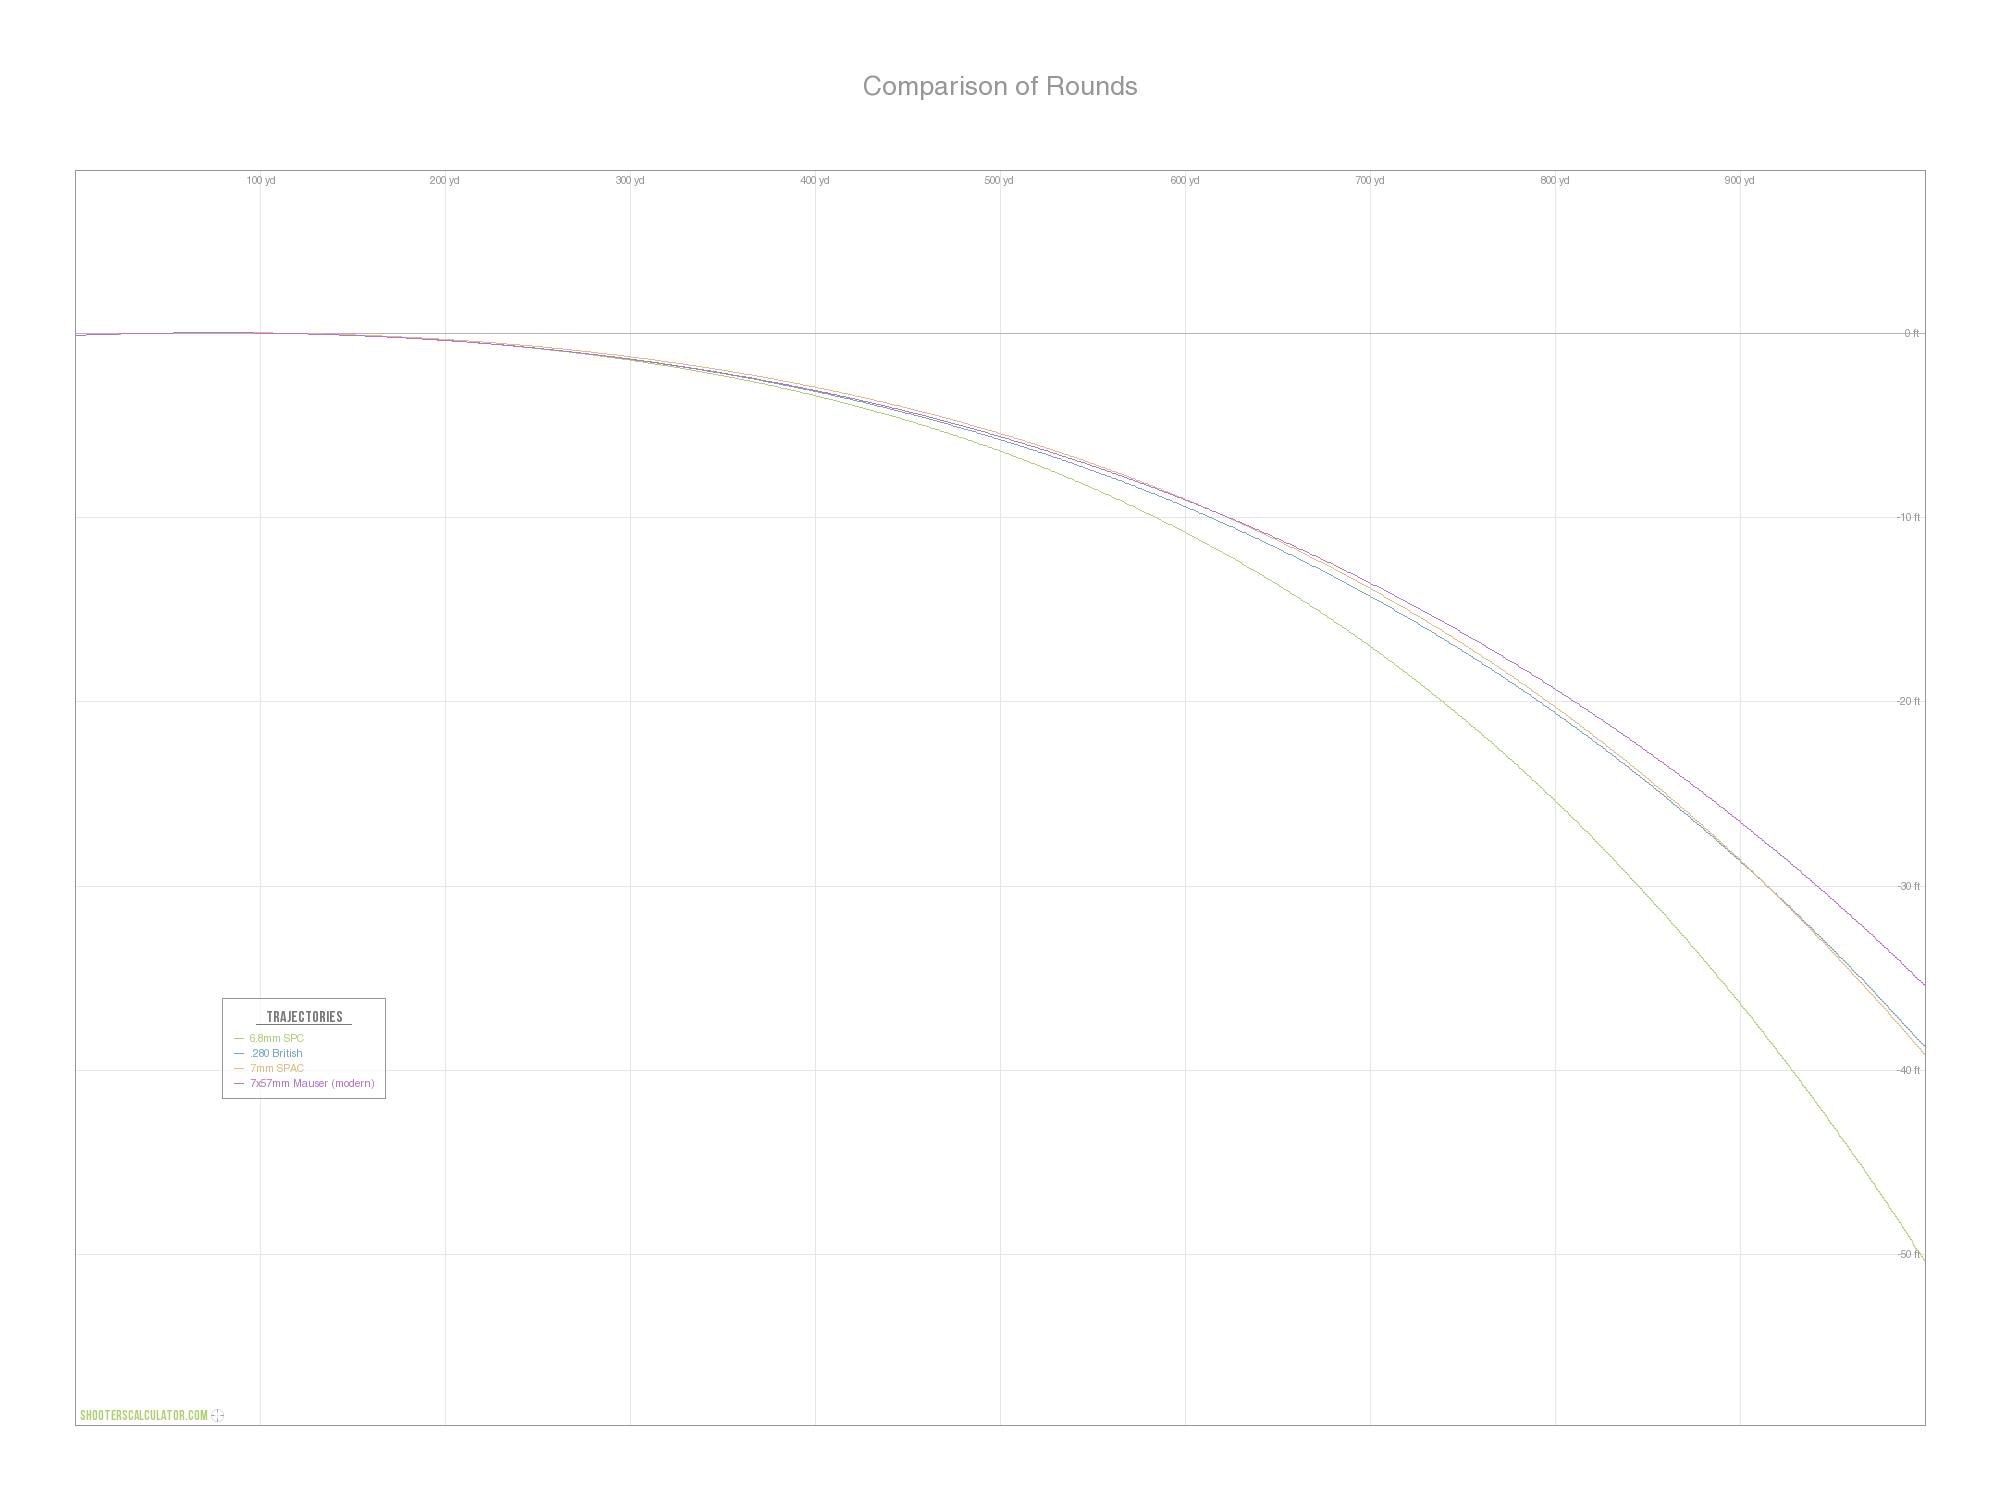 ShootersCalculator com | Comparison of Rounds